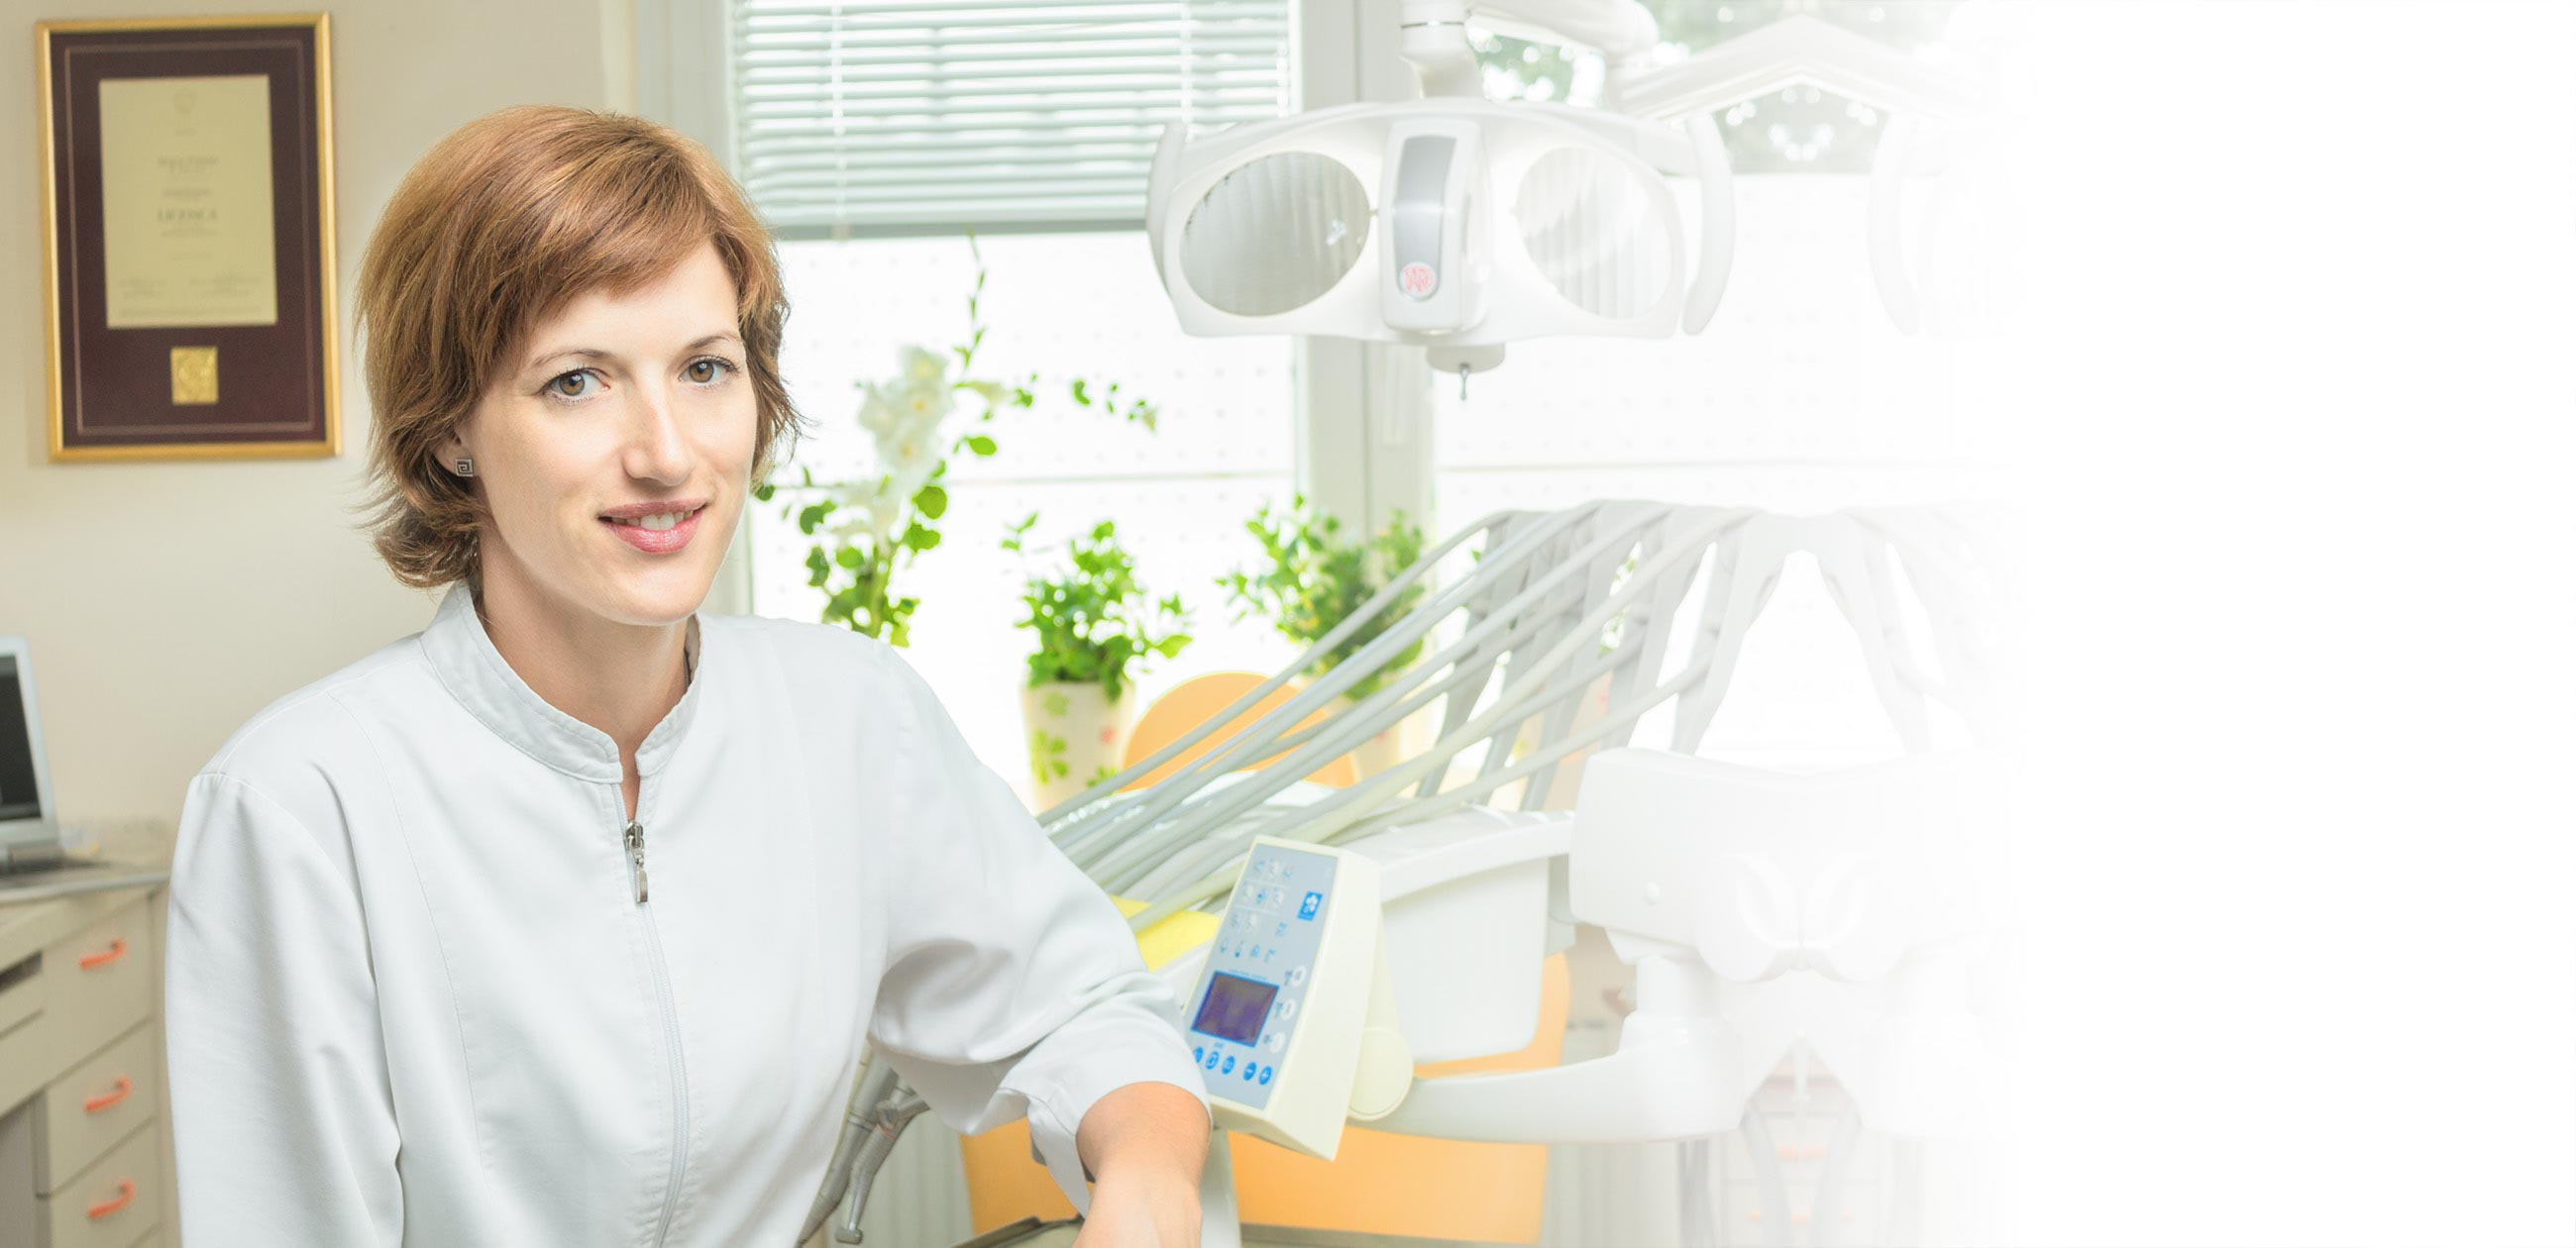 zobozdravstvena ordinacija